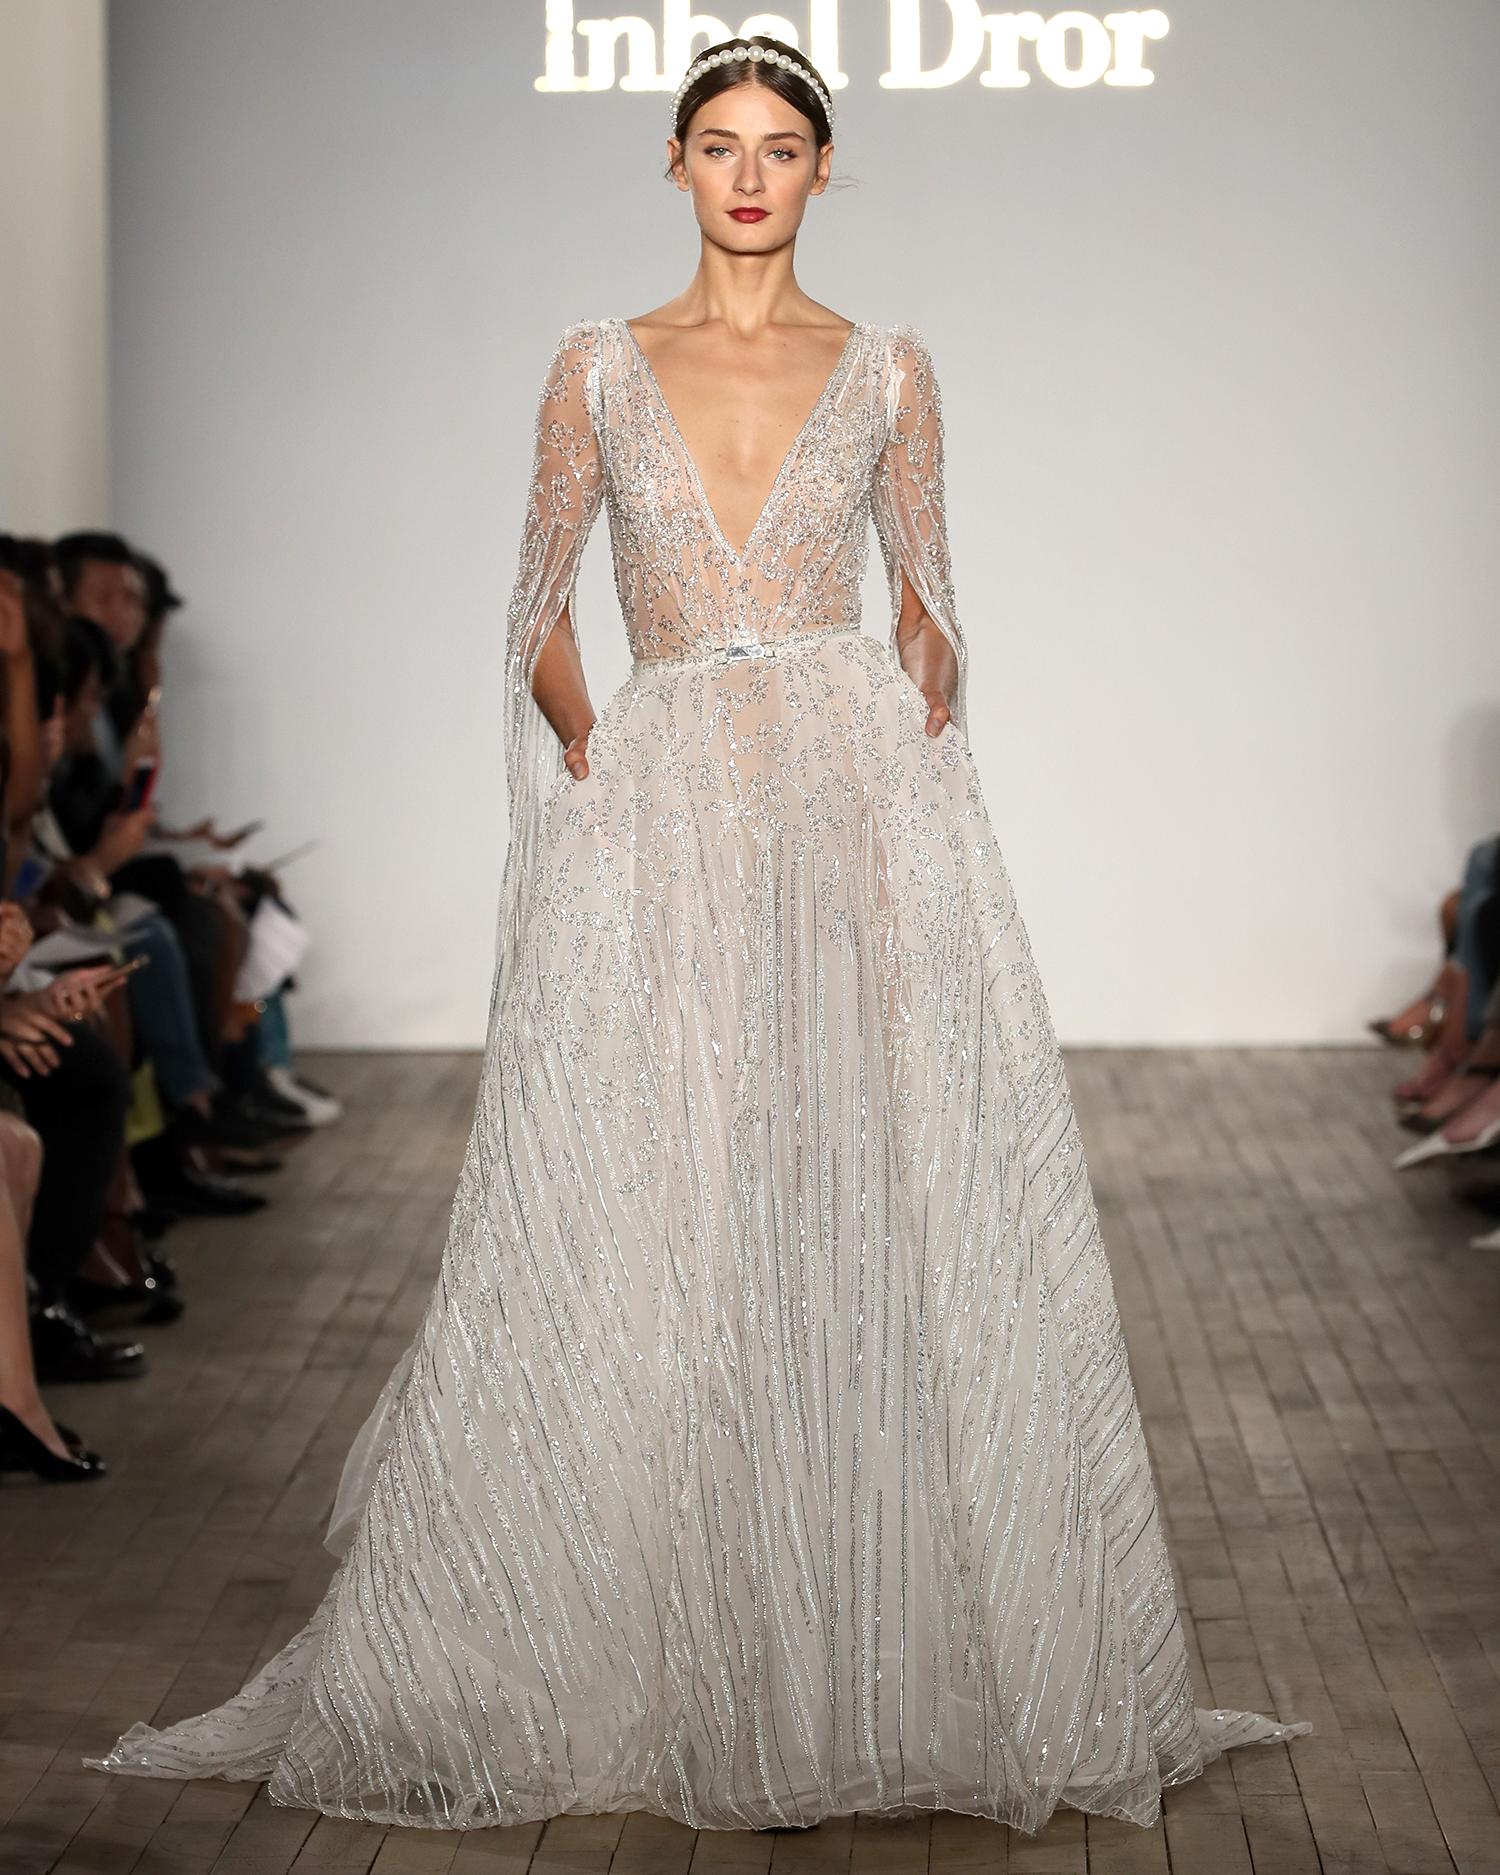 inbal dror wedding dress sheer v-neck with vertical beading